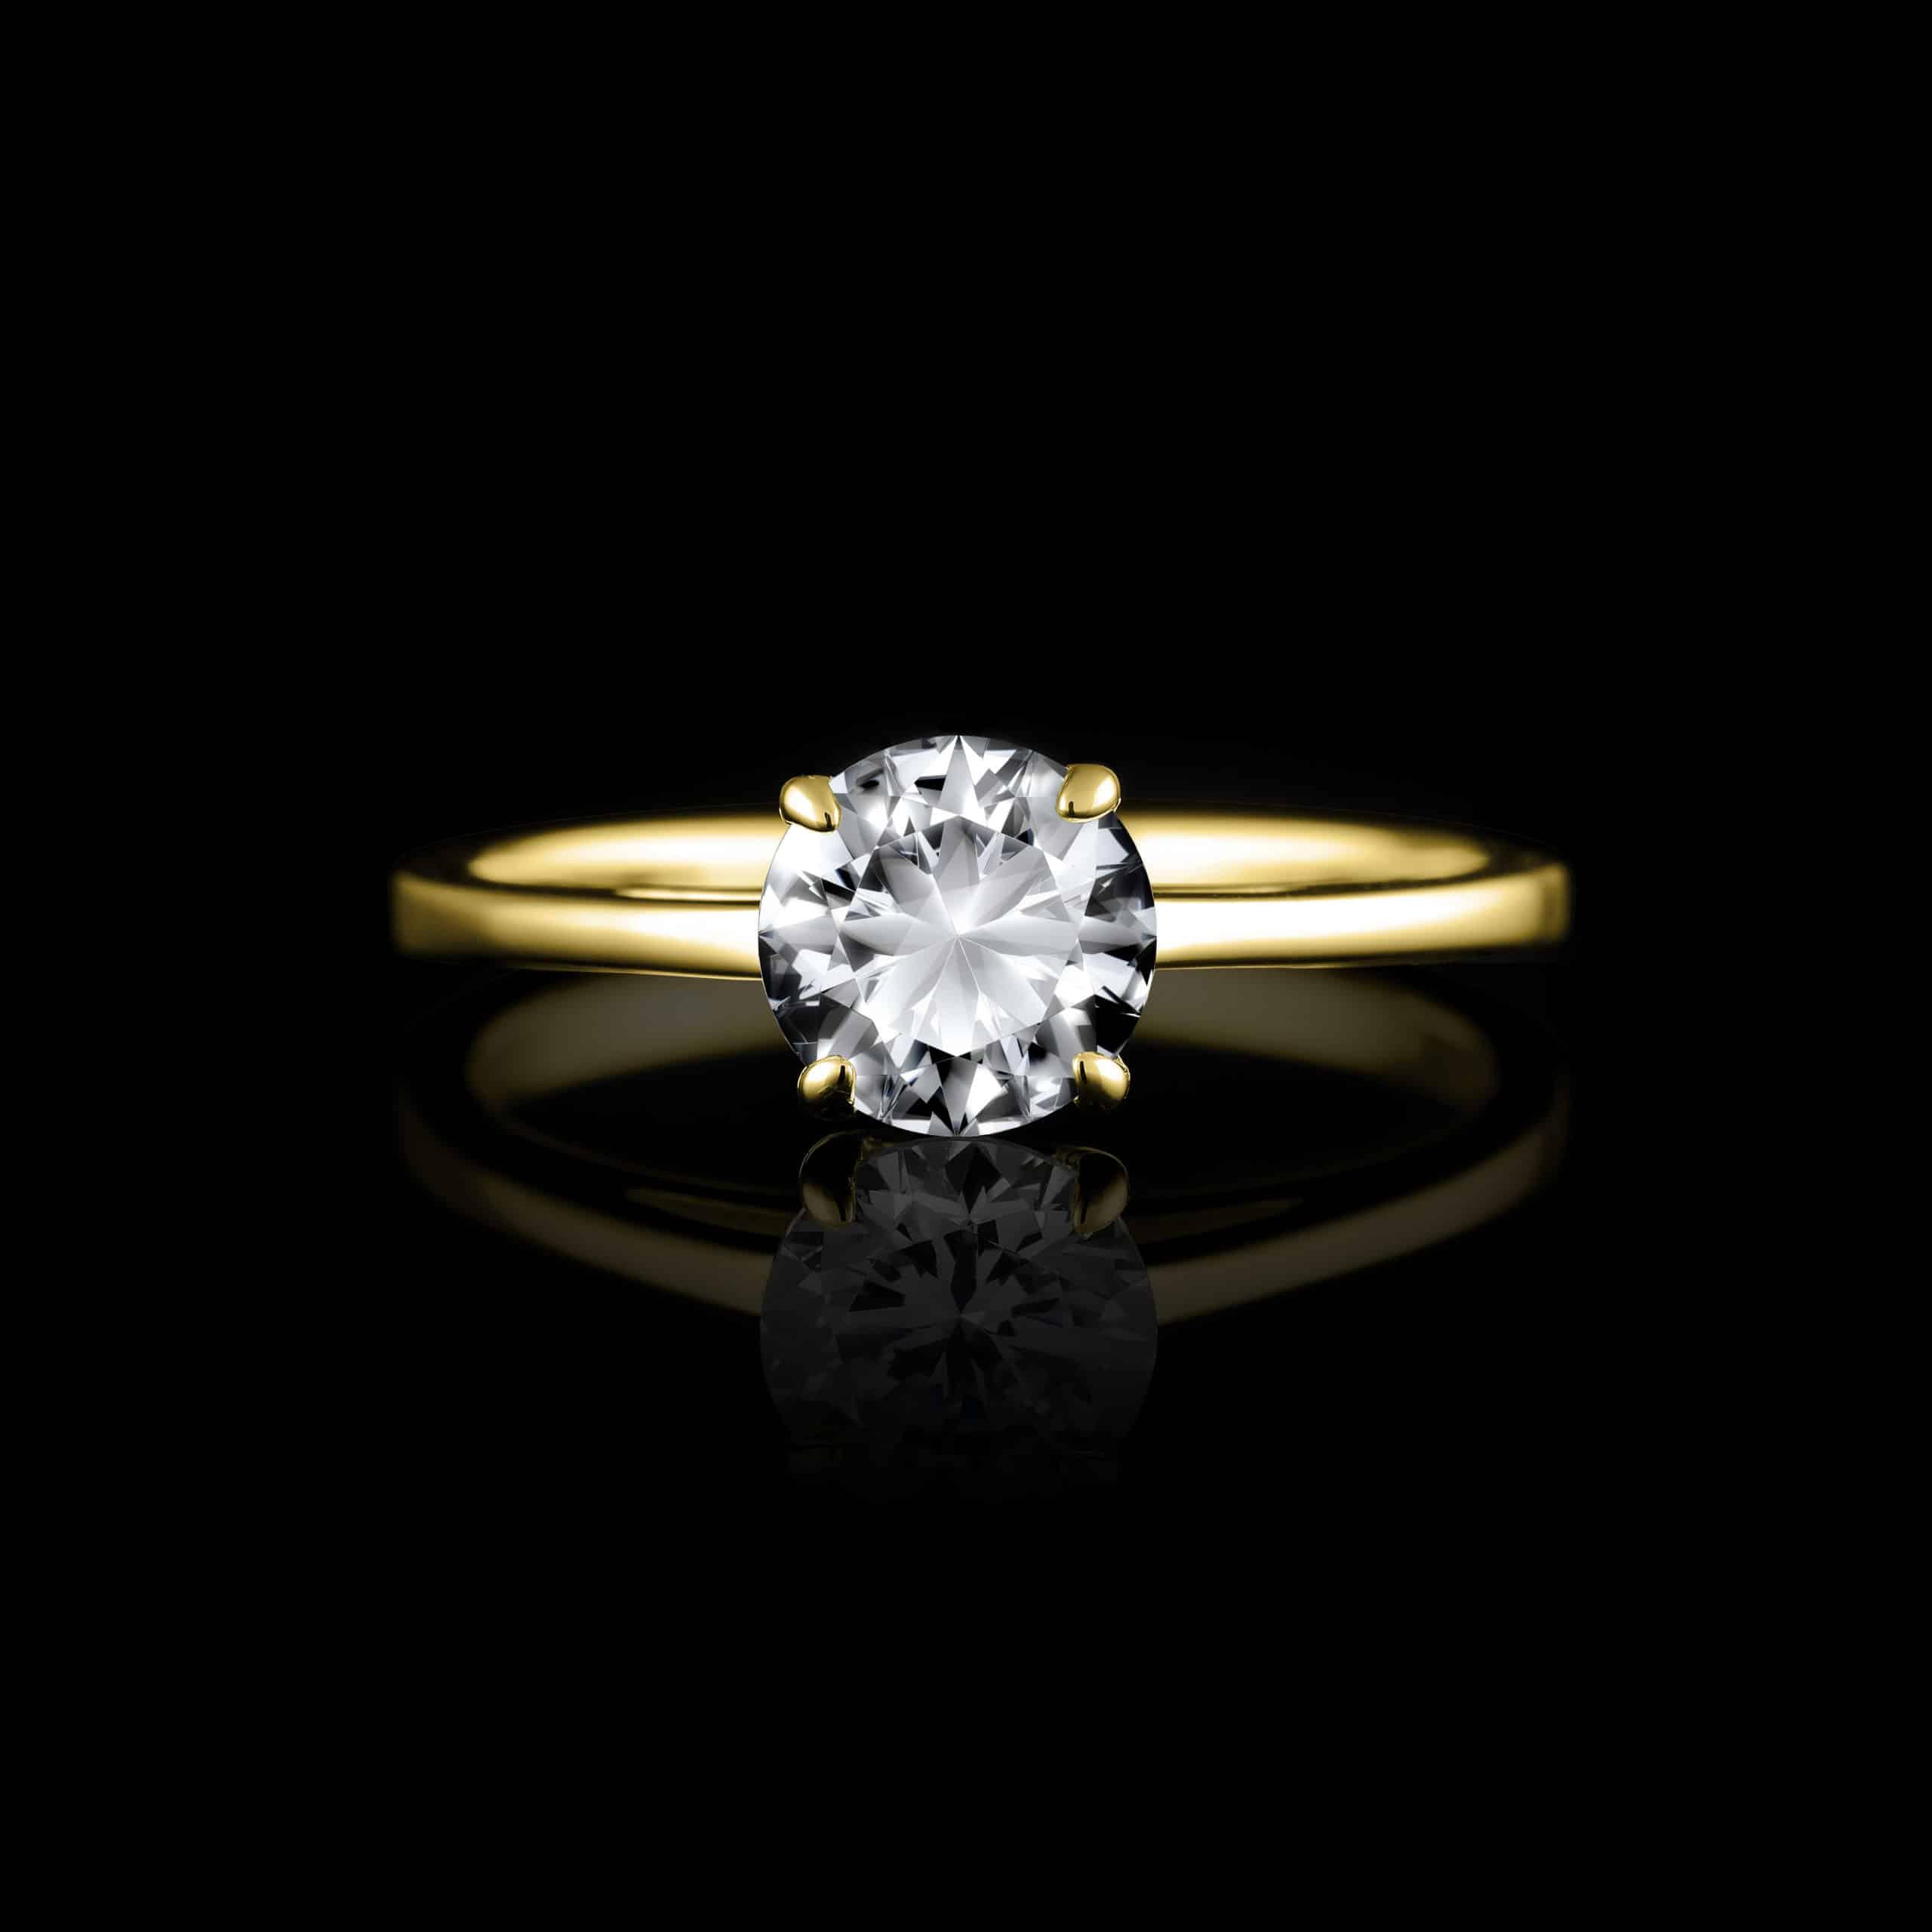 Prstene s jedným kameňom